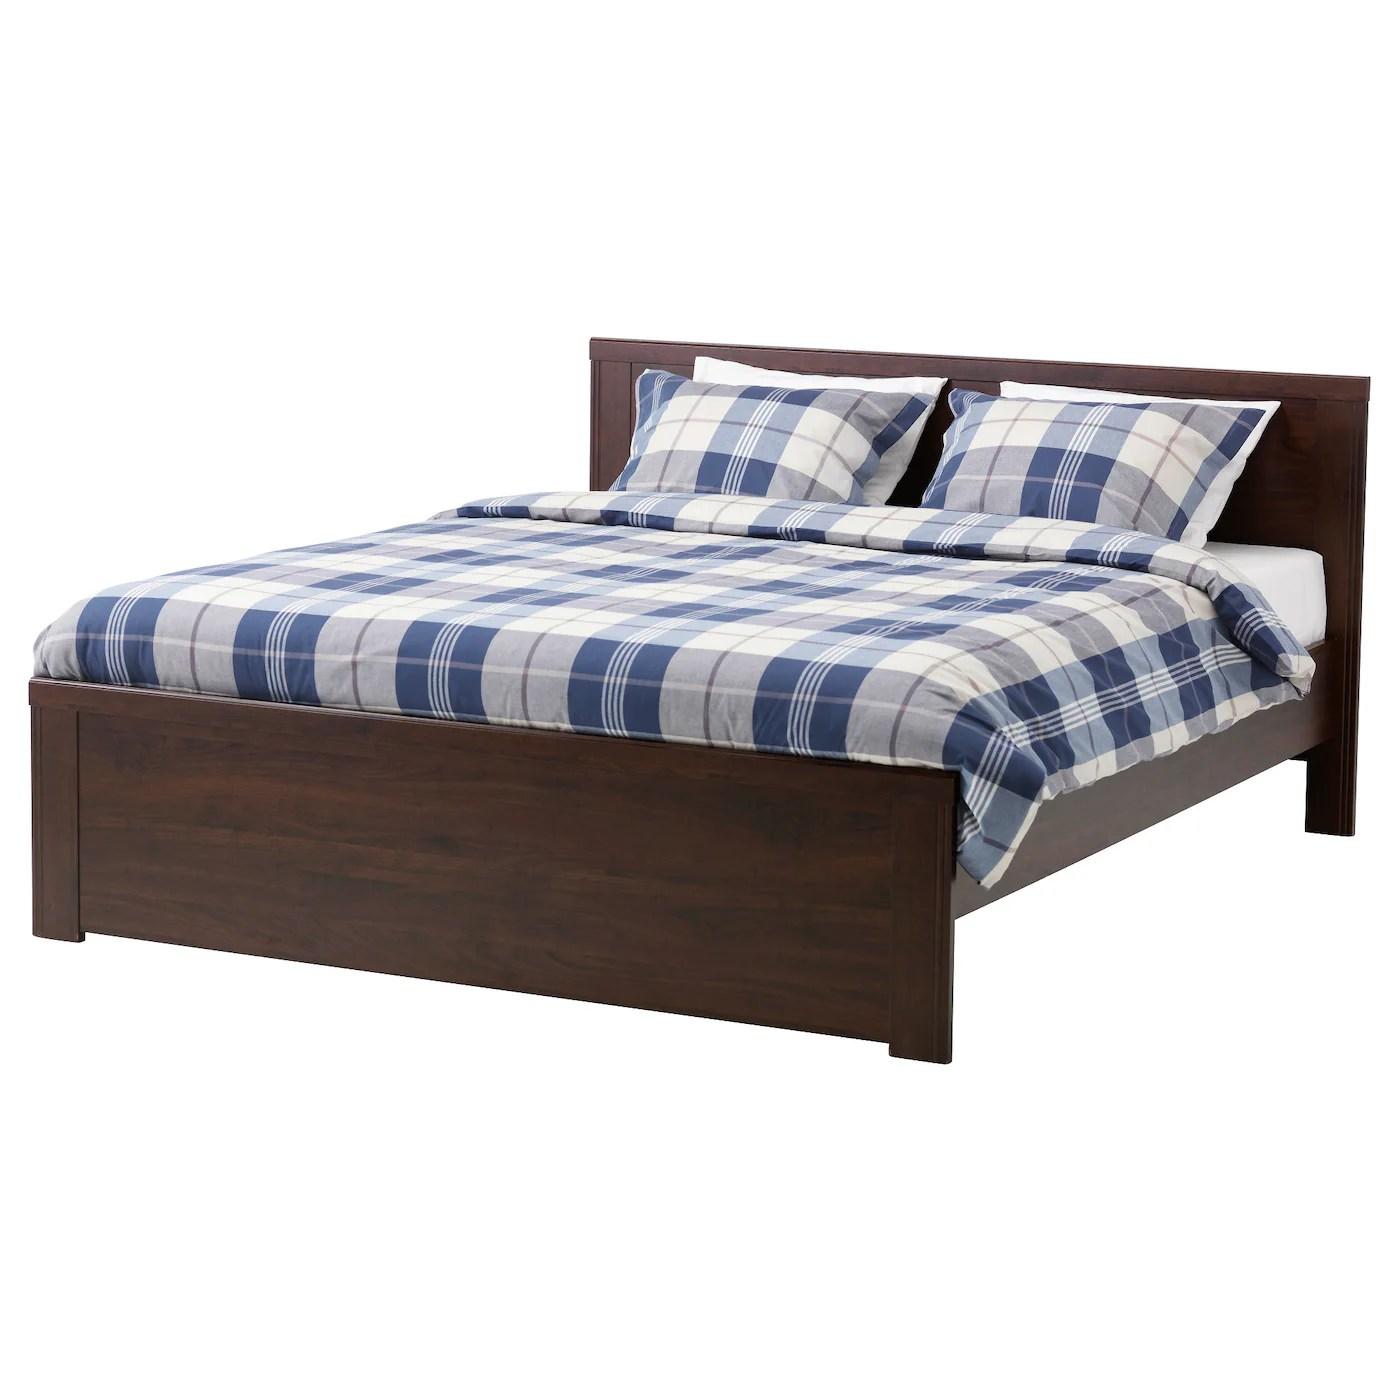 Brusali Bed Frame Brown Luroy Standard Double